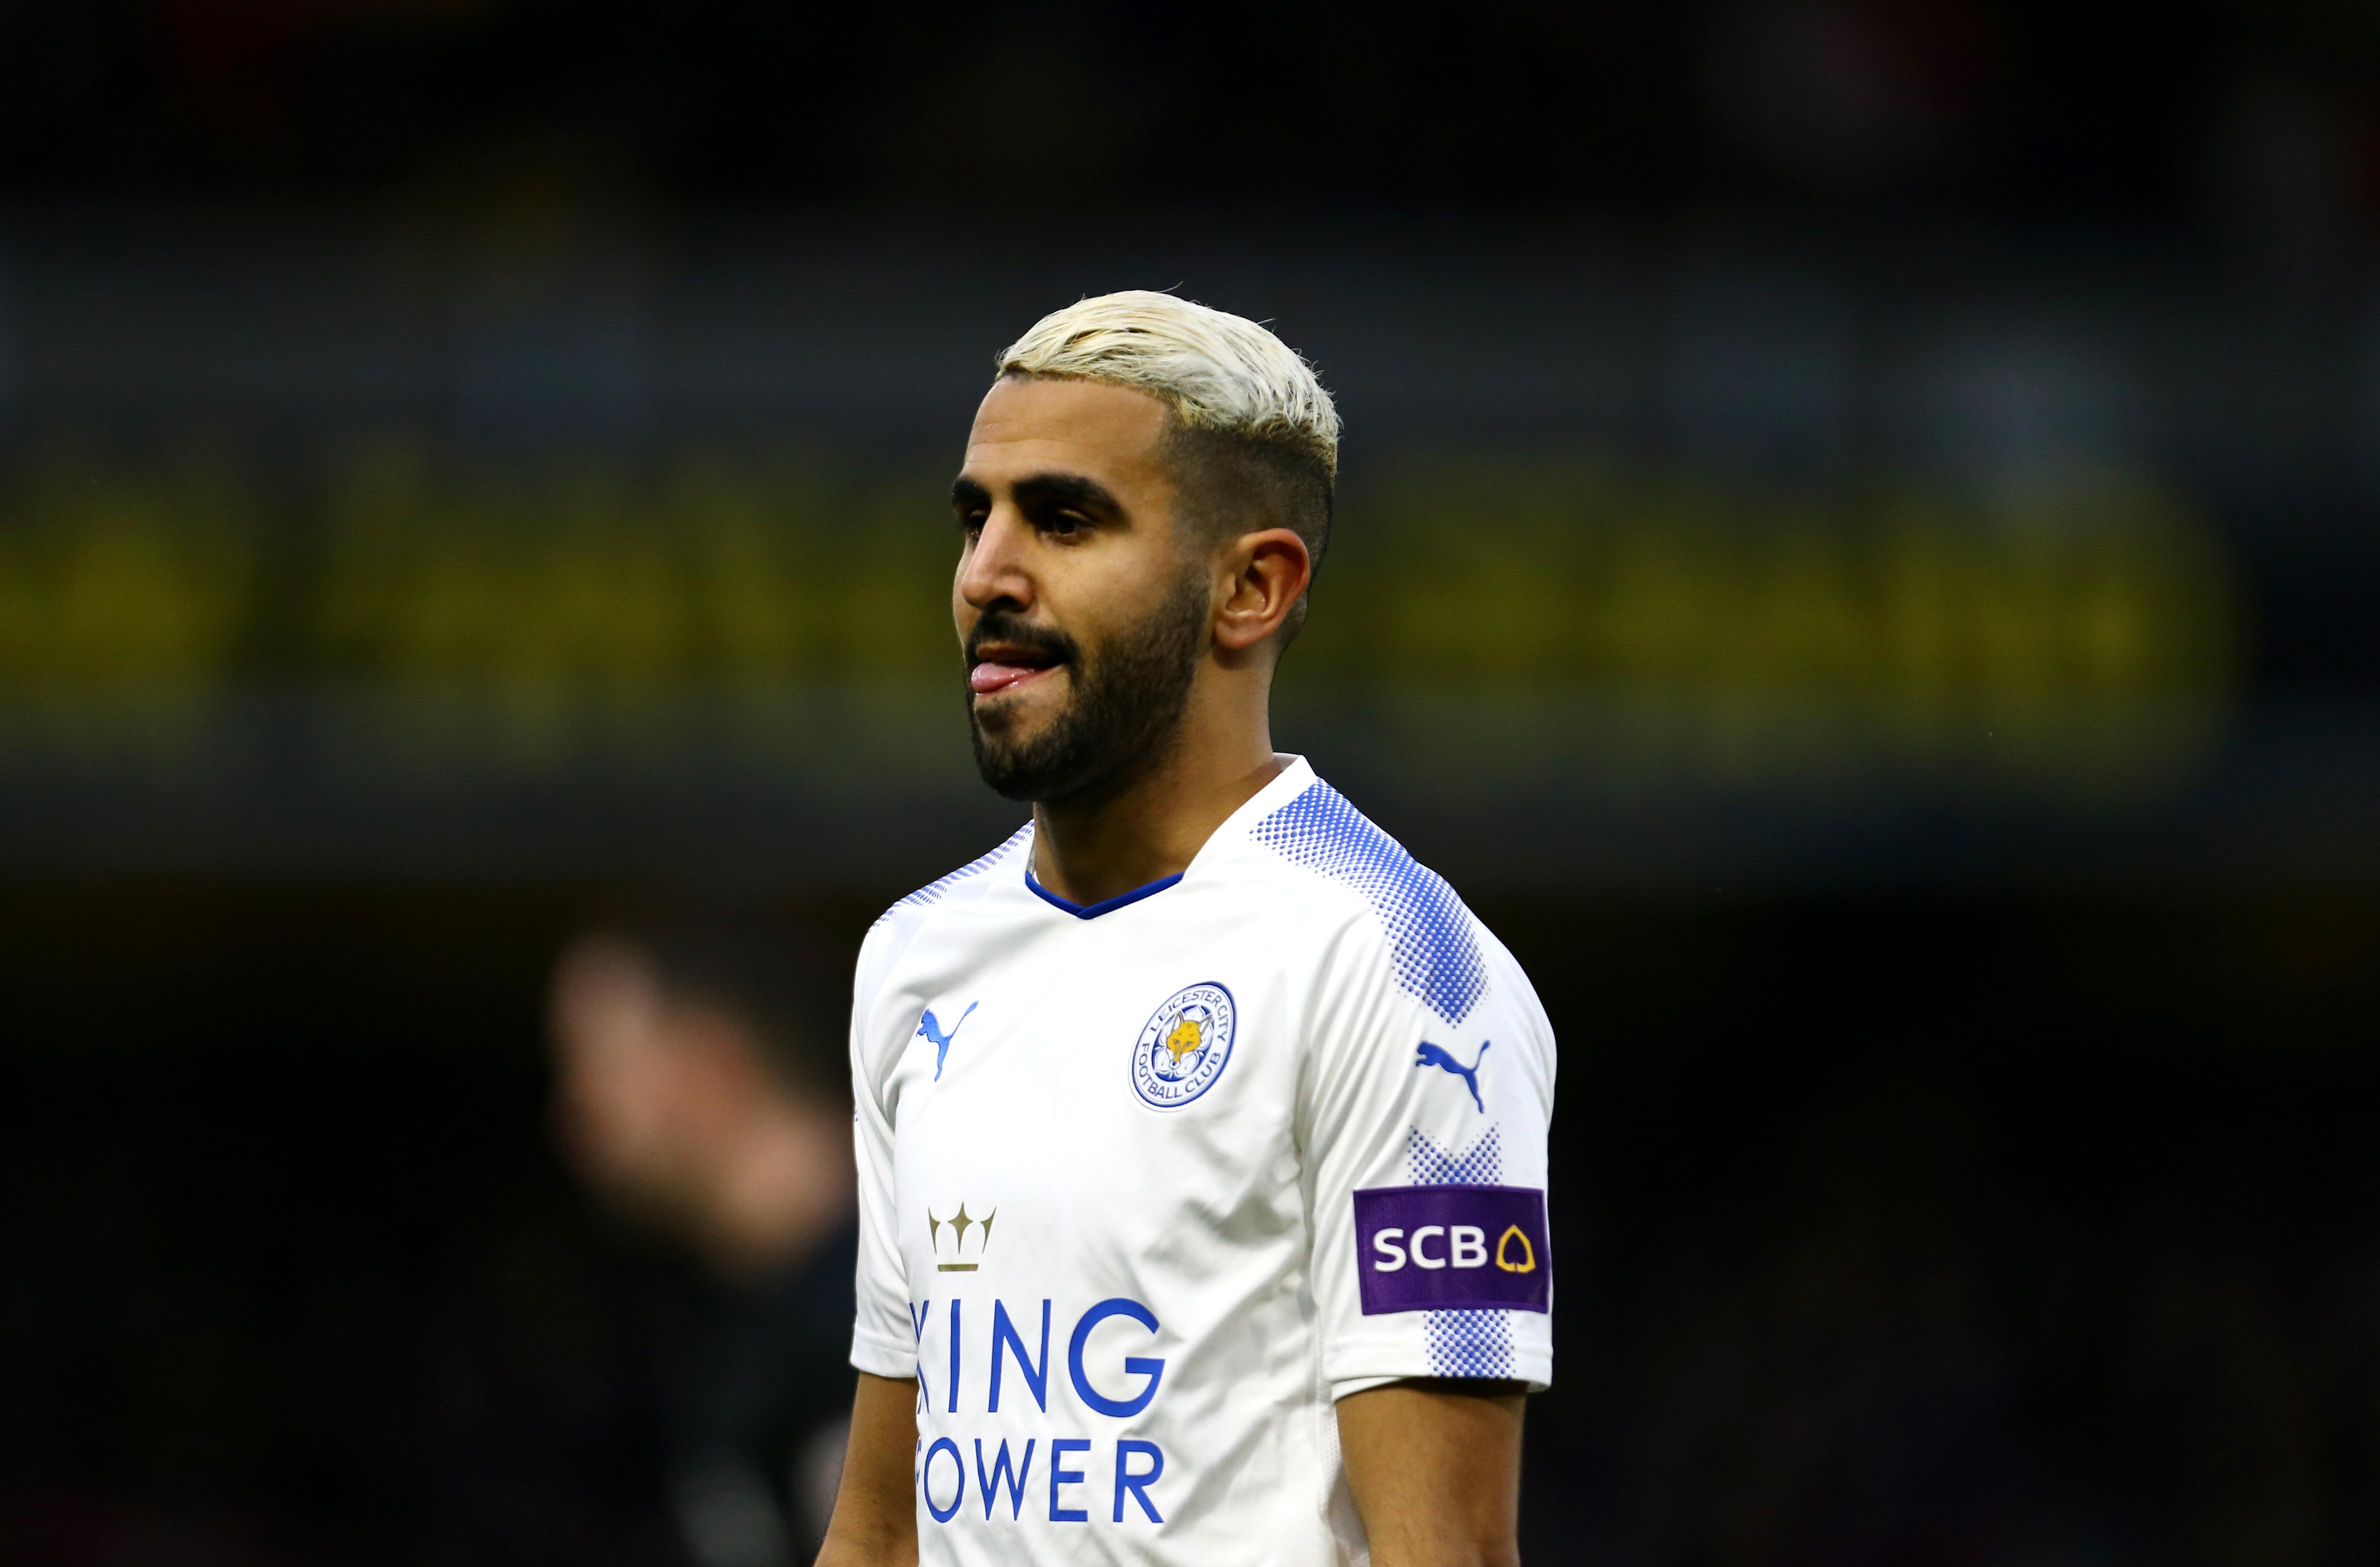 Maillot Extérieur Manchester City Riyad Mahrez